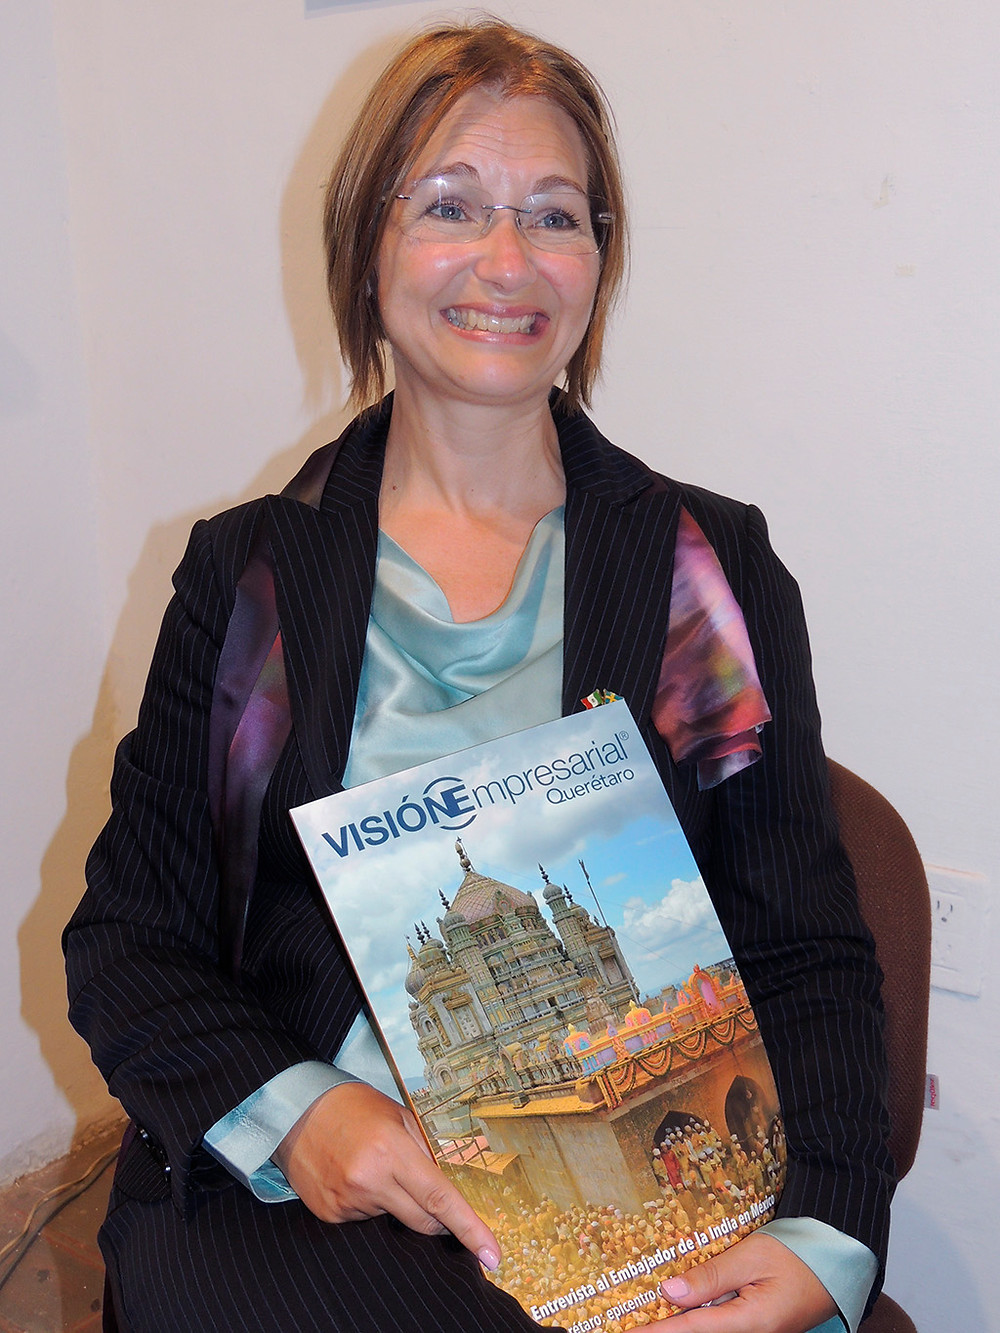 Excelentísima Embajadora Annika Thunborg